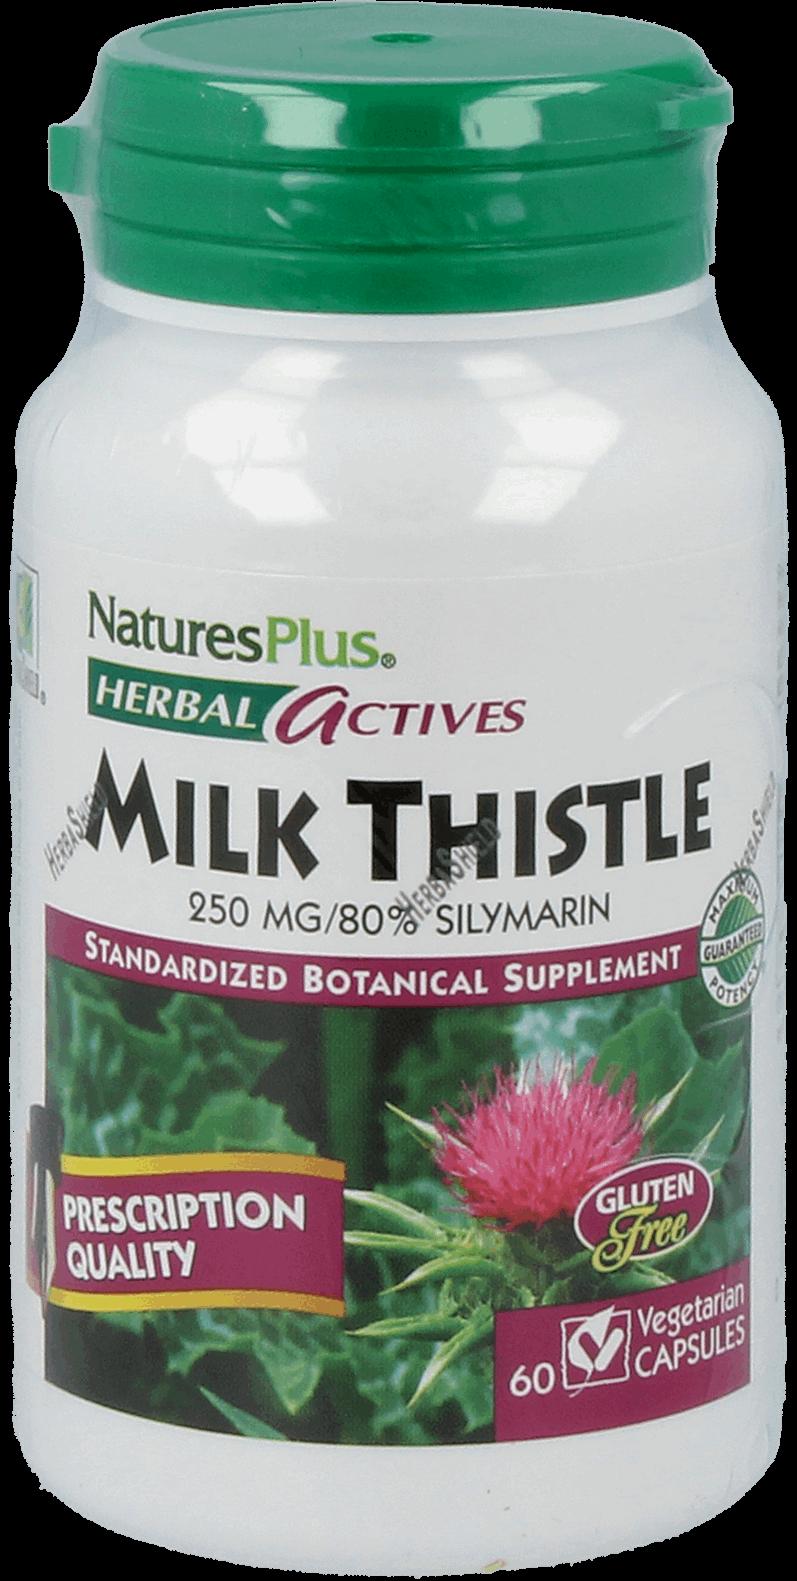 Milk Thistle 250 mg